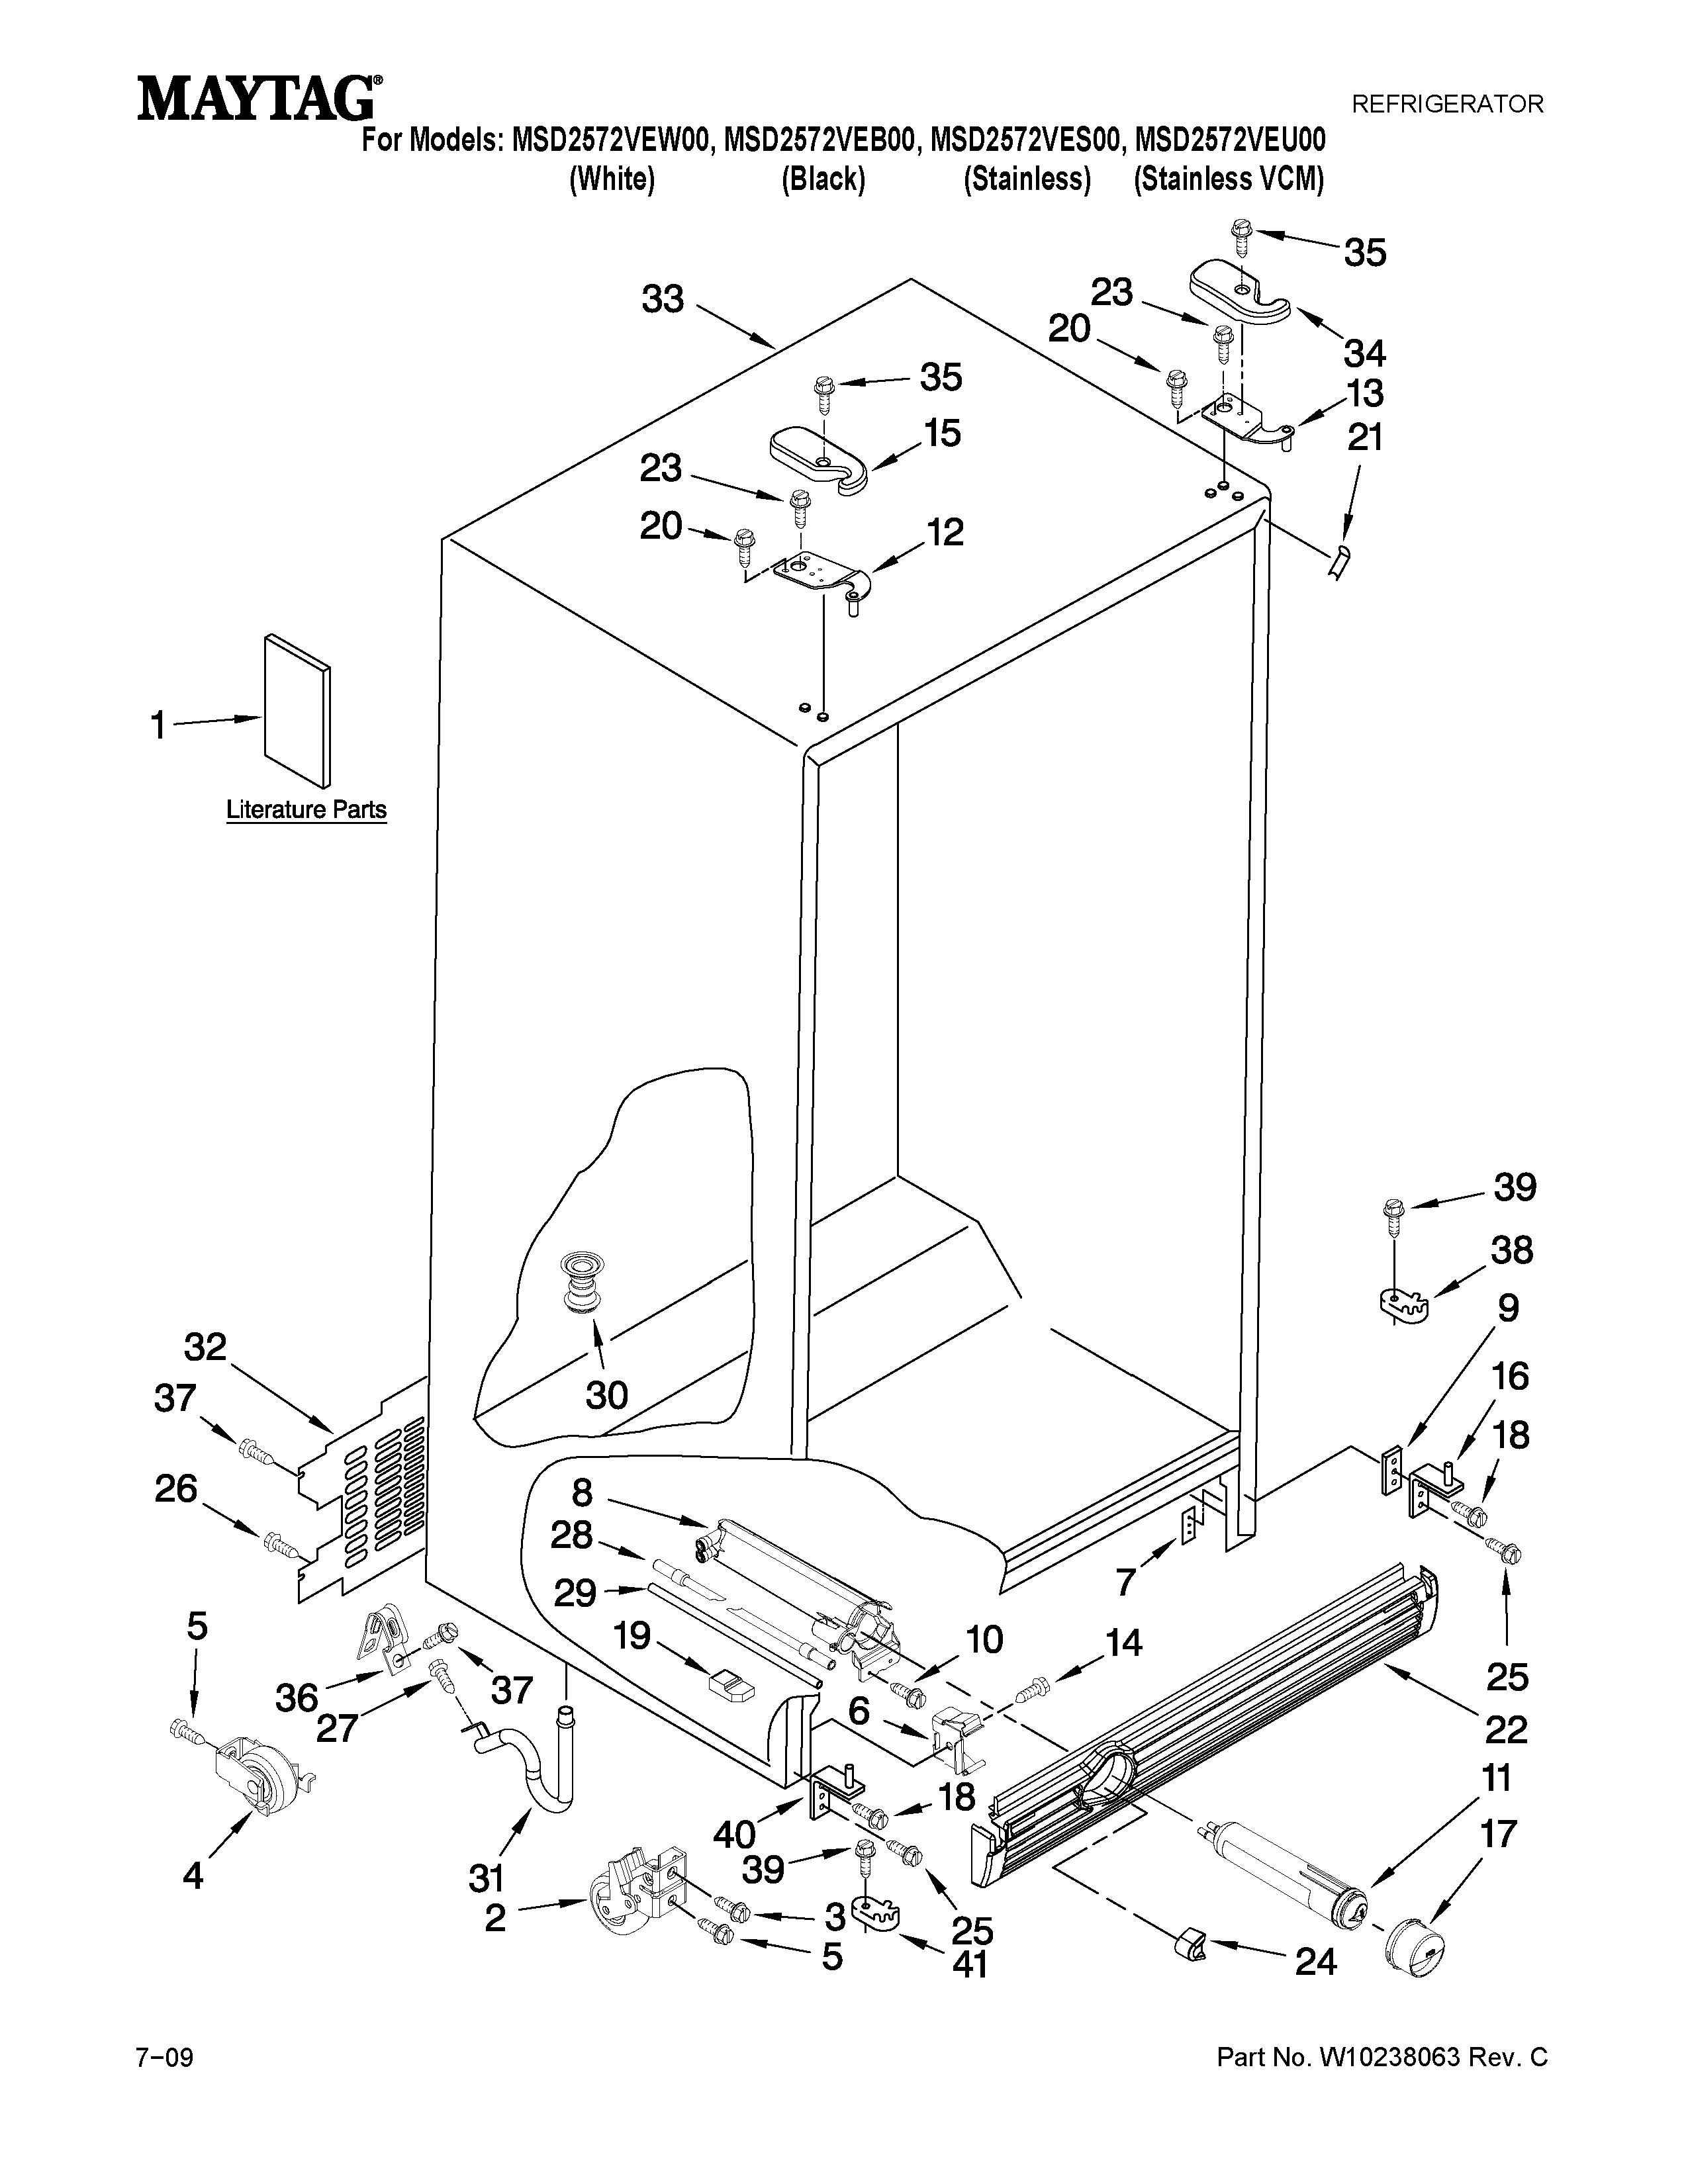 Maytag model MSD2572VEB00 side-by-side refrigerator